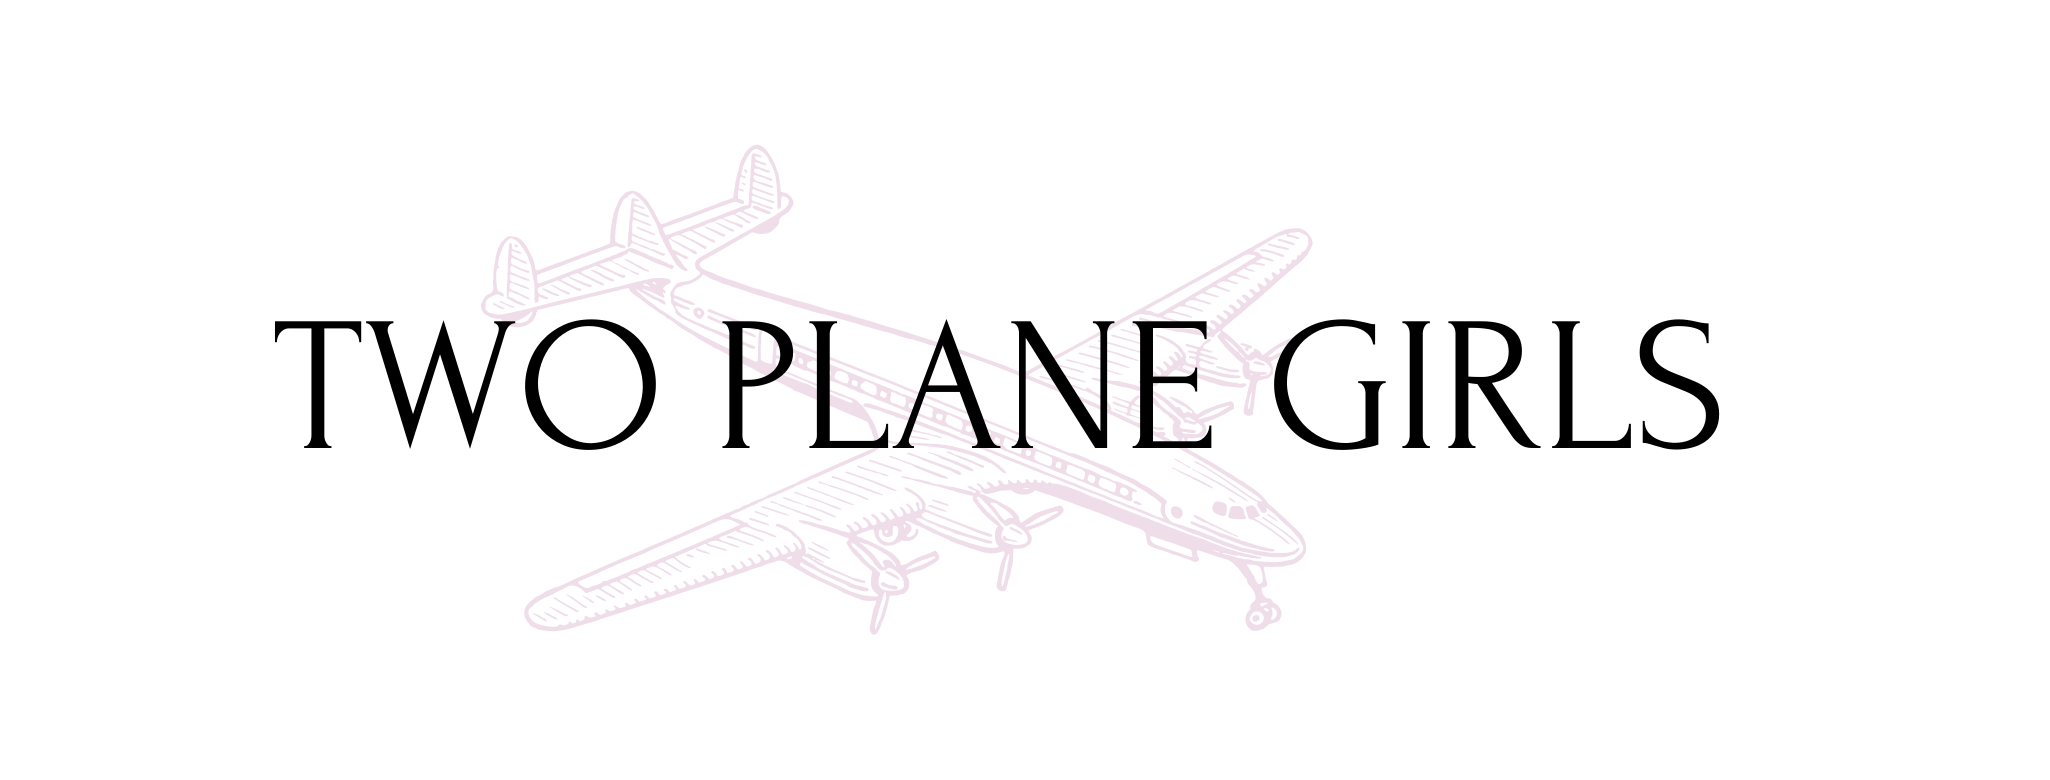 Two Plane Girls